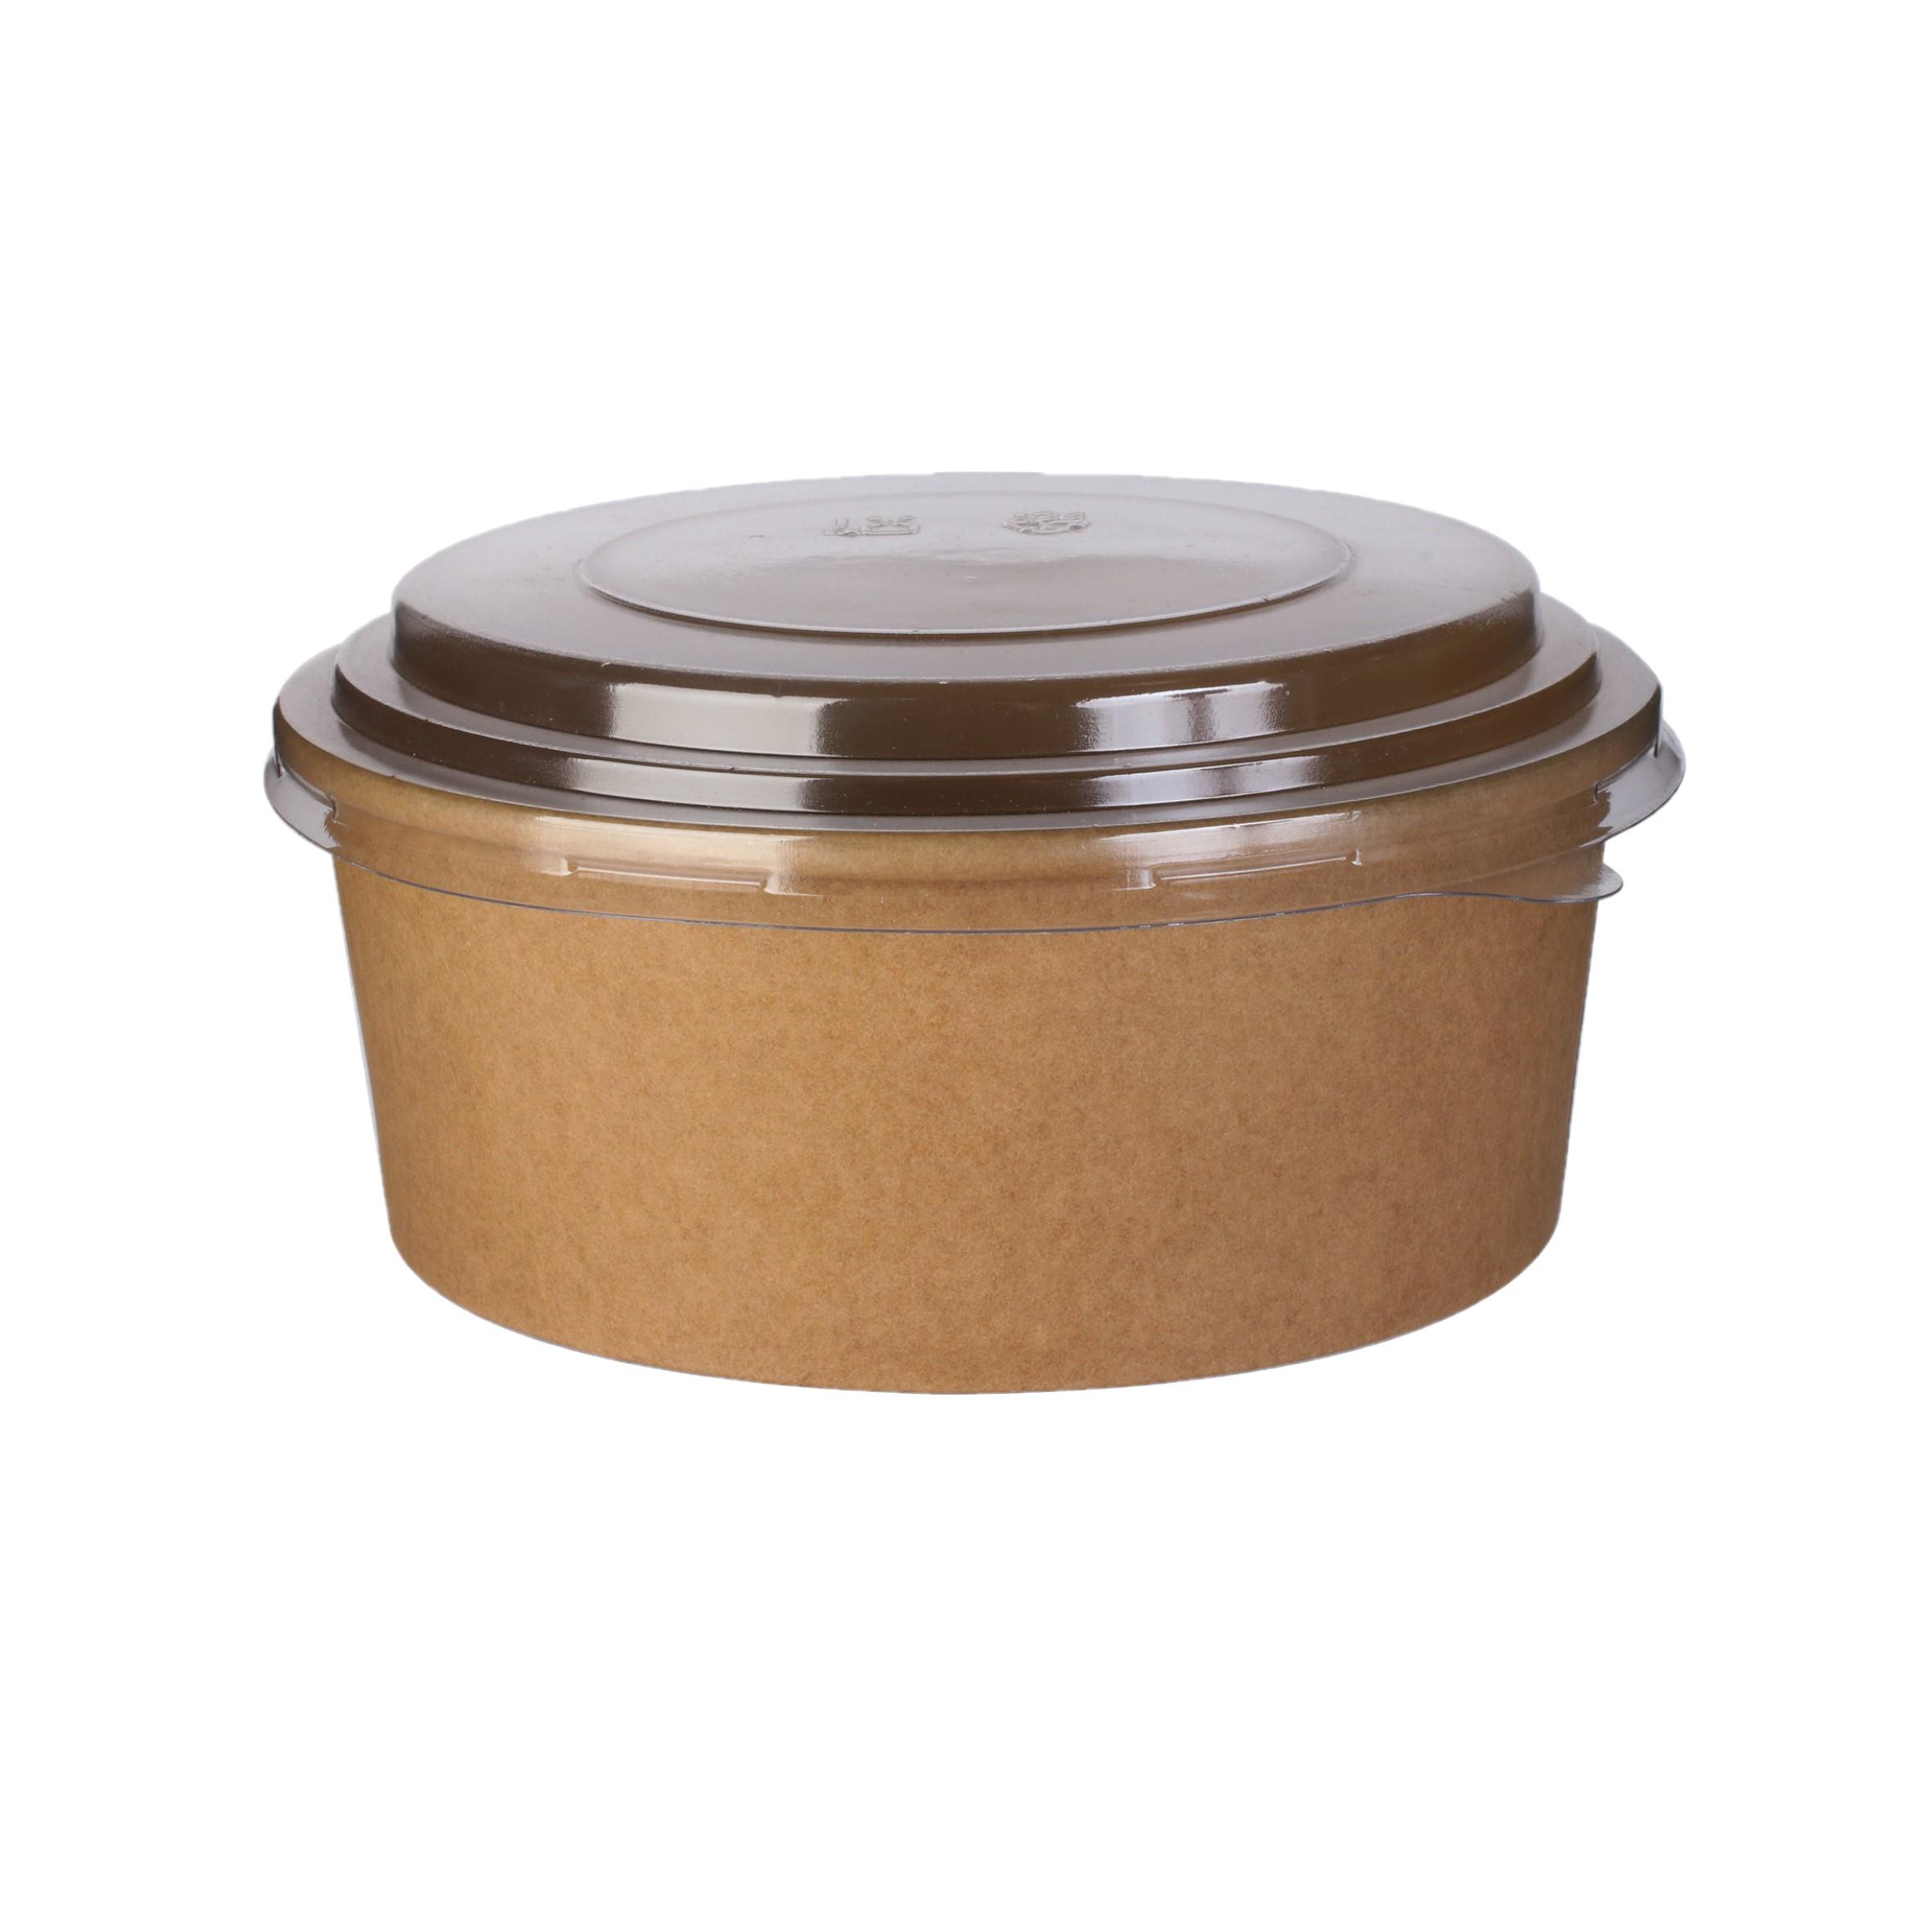 Saladier carton 750 ml